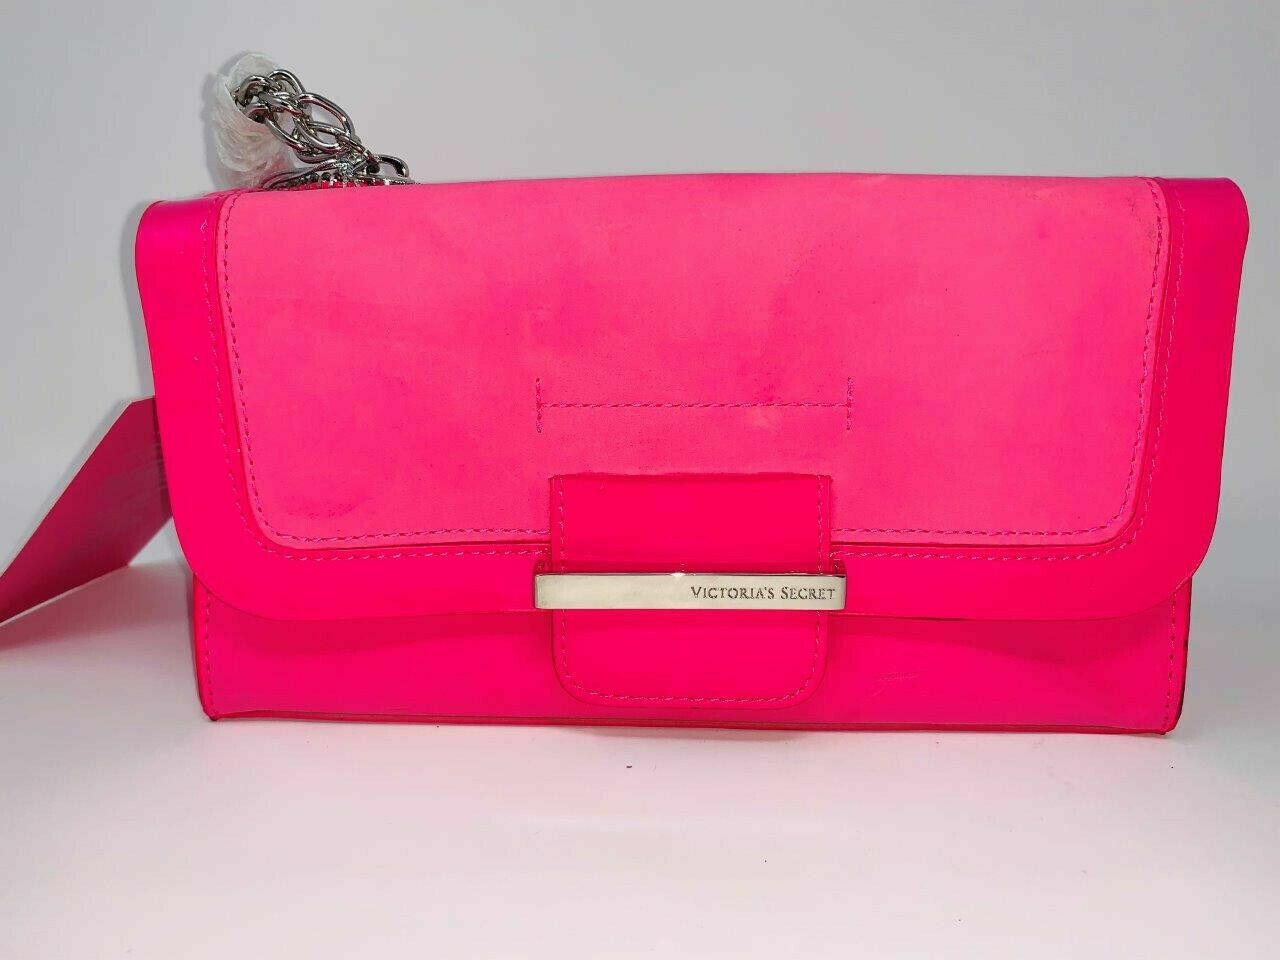 New Victoria secret Pink Bombshell Cosmetic bag  clutch  mak